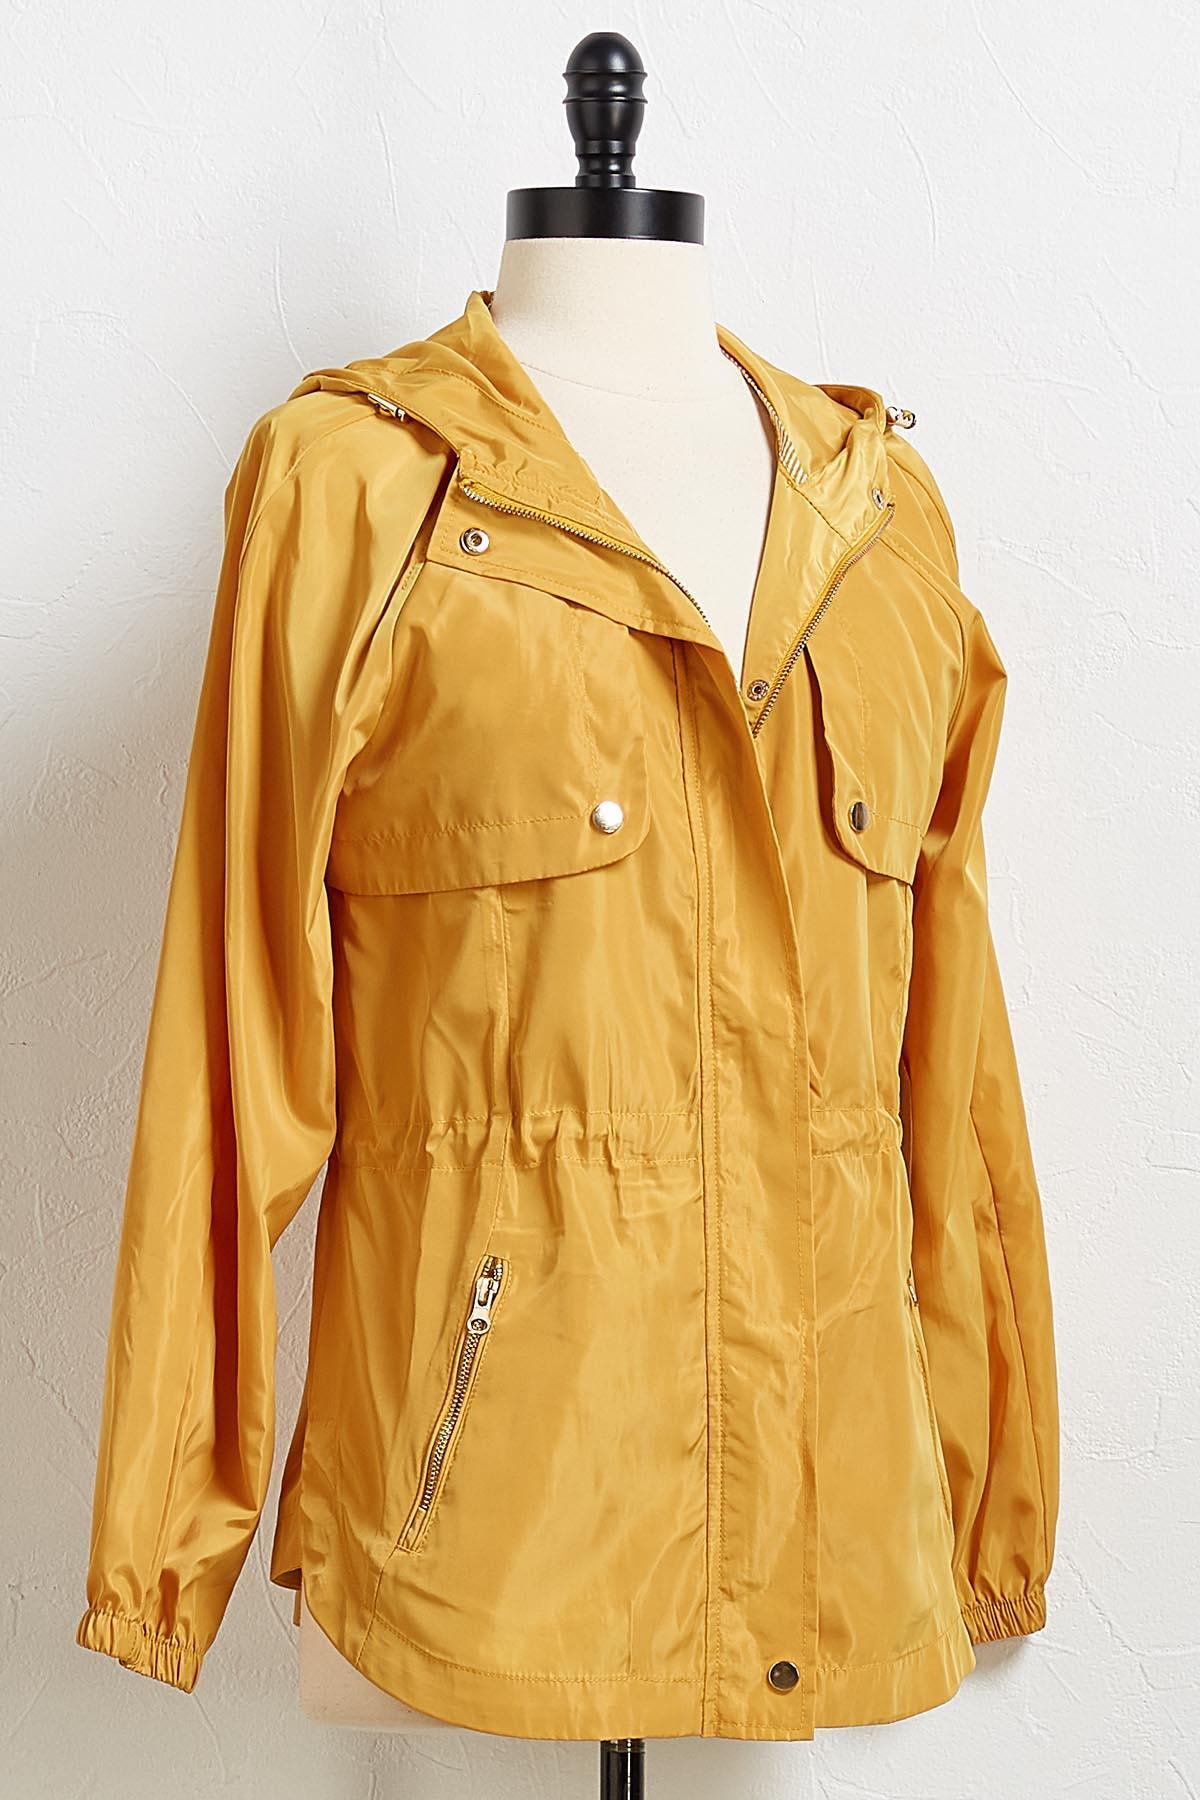 Singing In The Rain Jacket